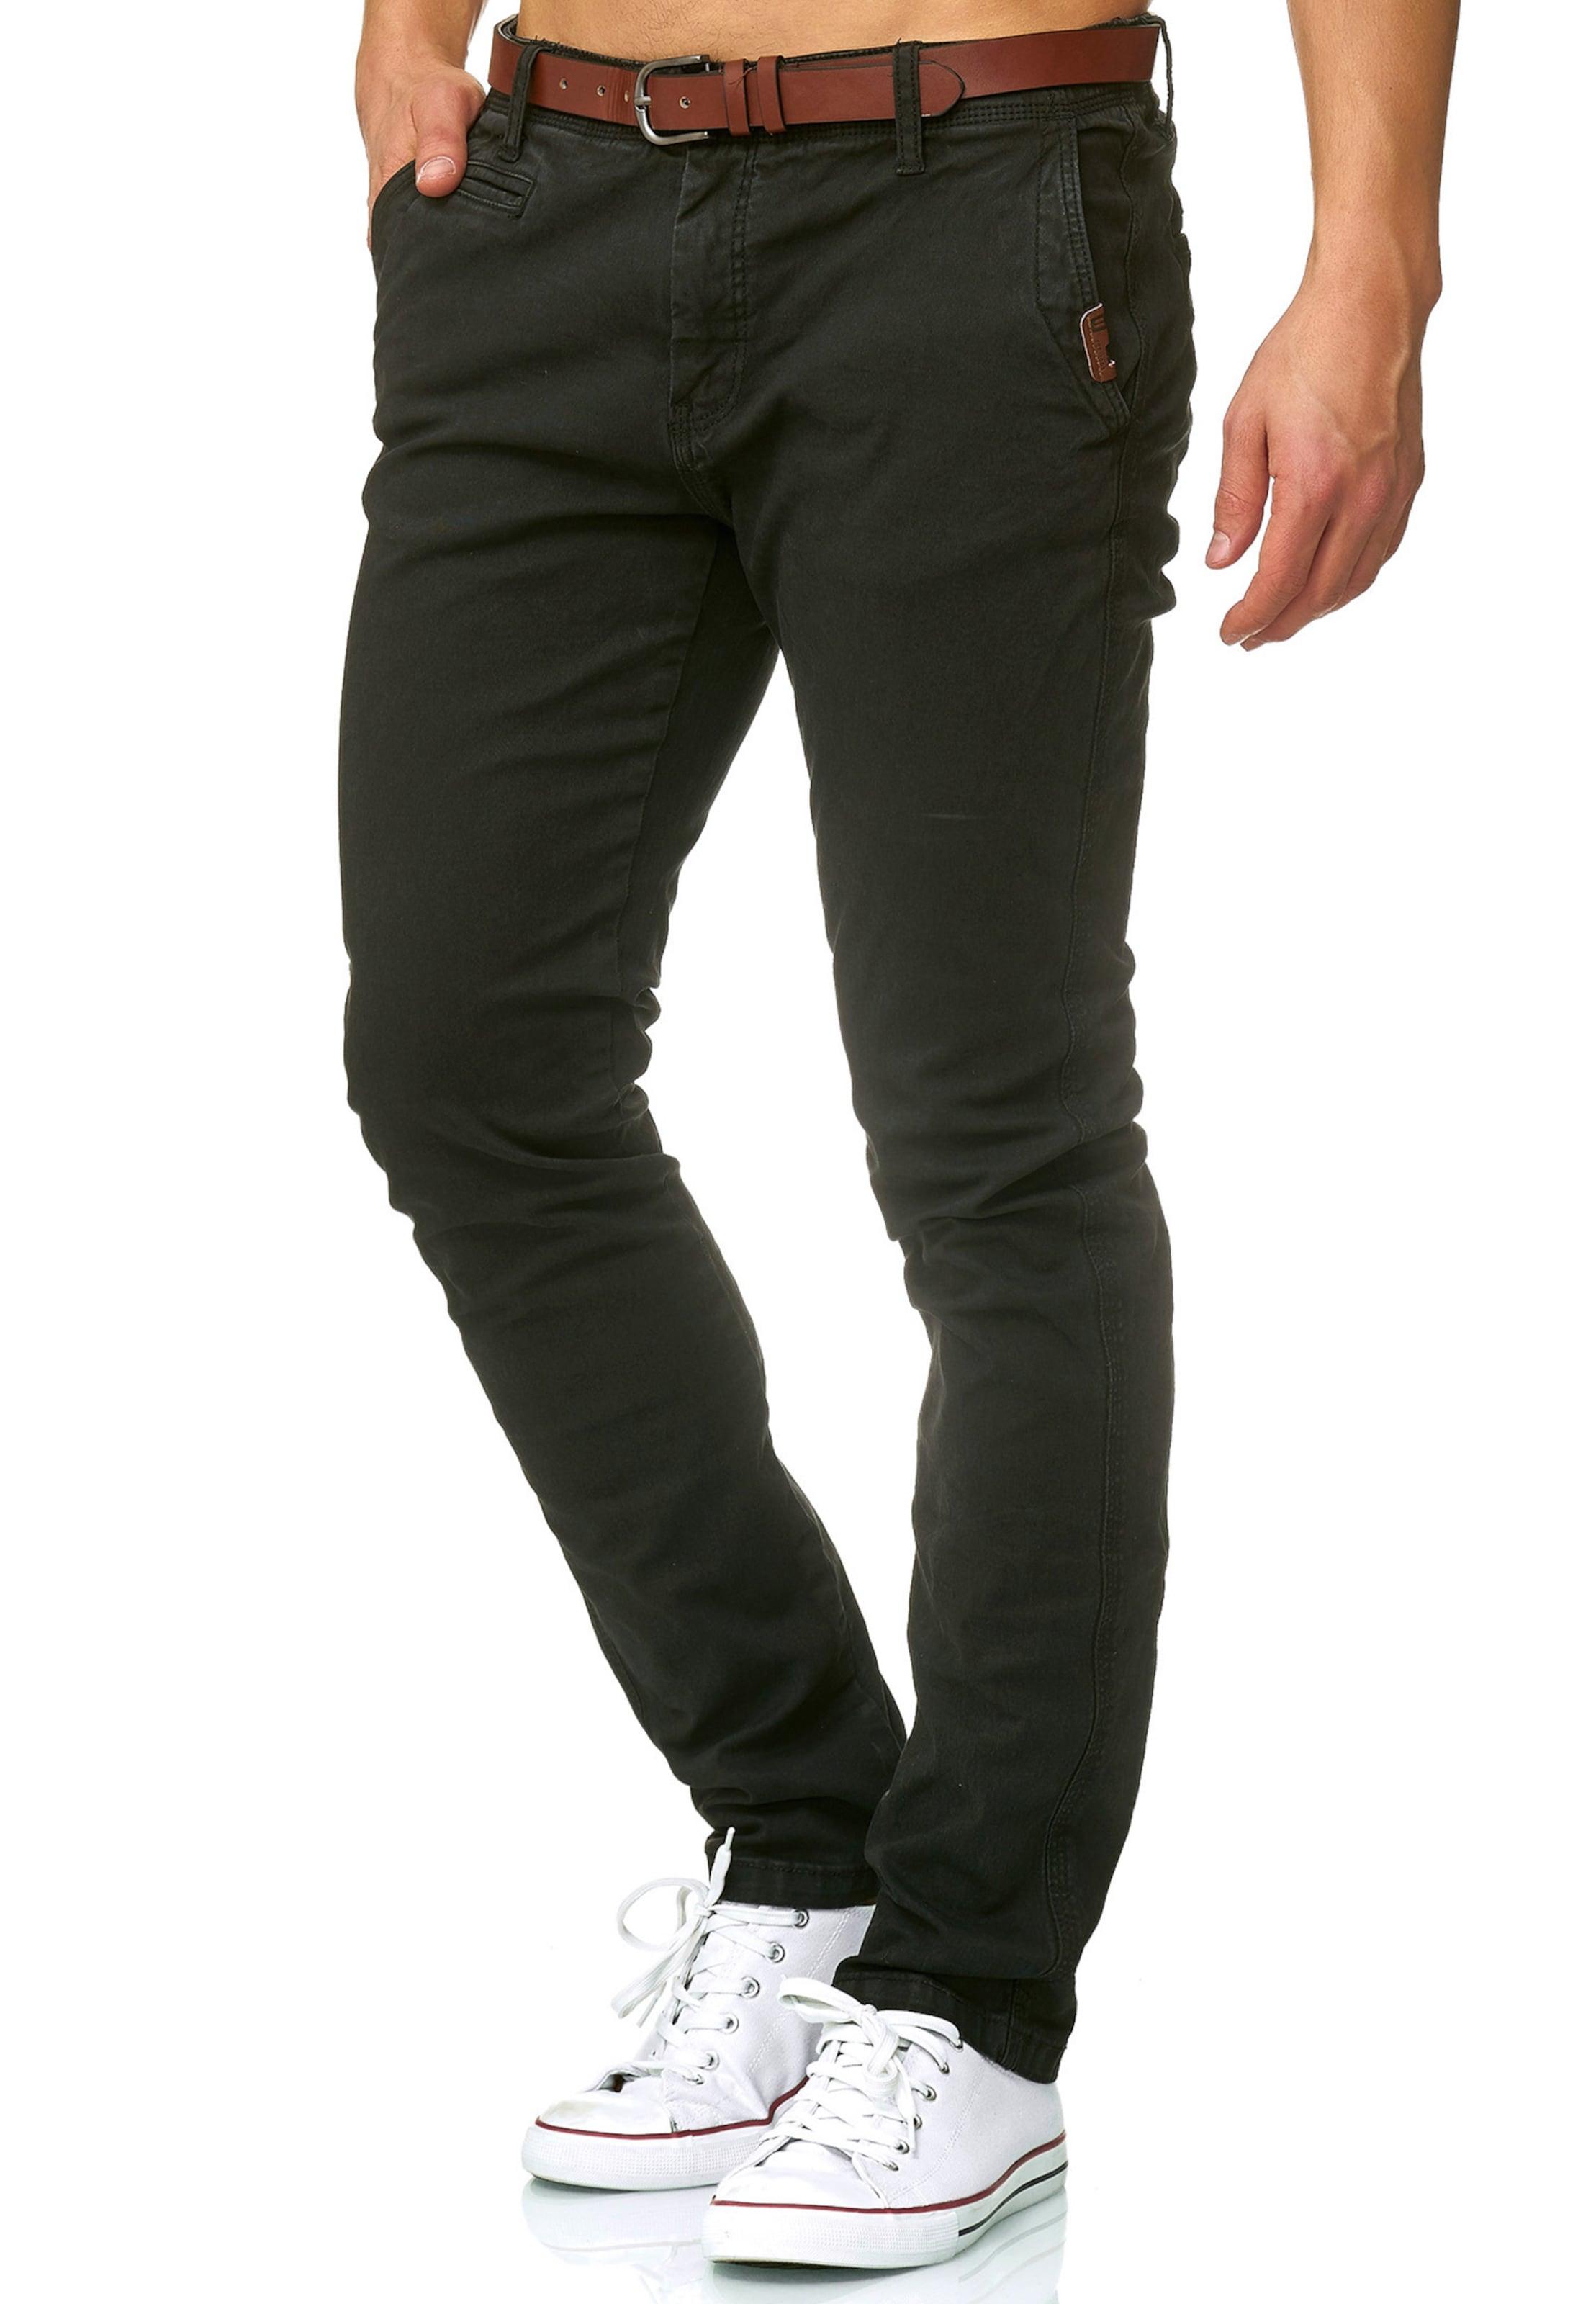 In Schwarz Indicode Chino 'cherry' Jeans clTK1FJ3